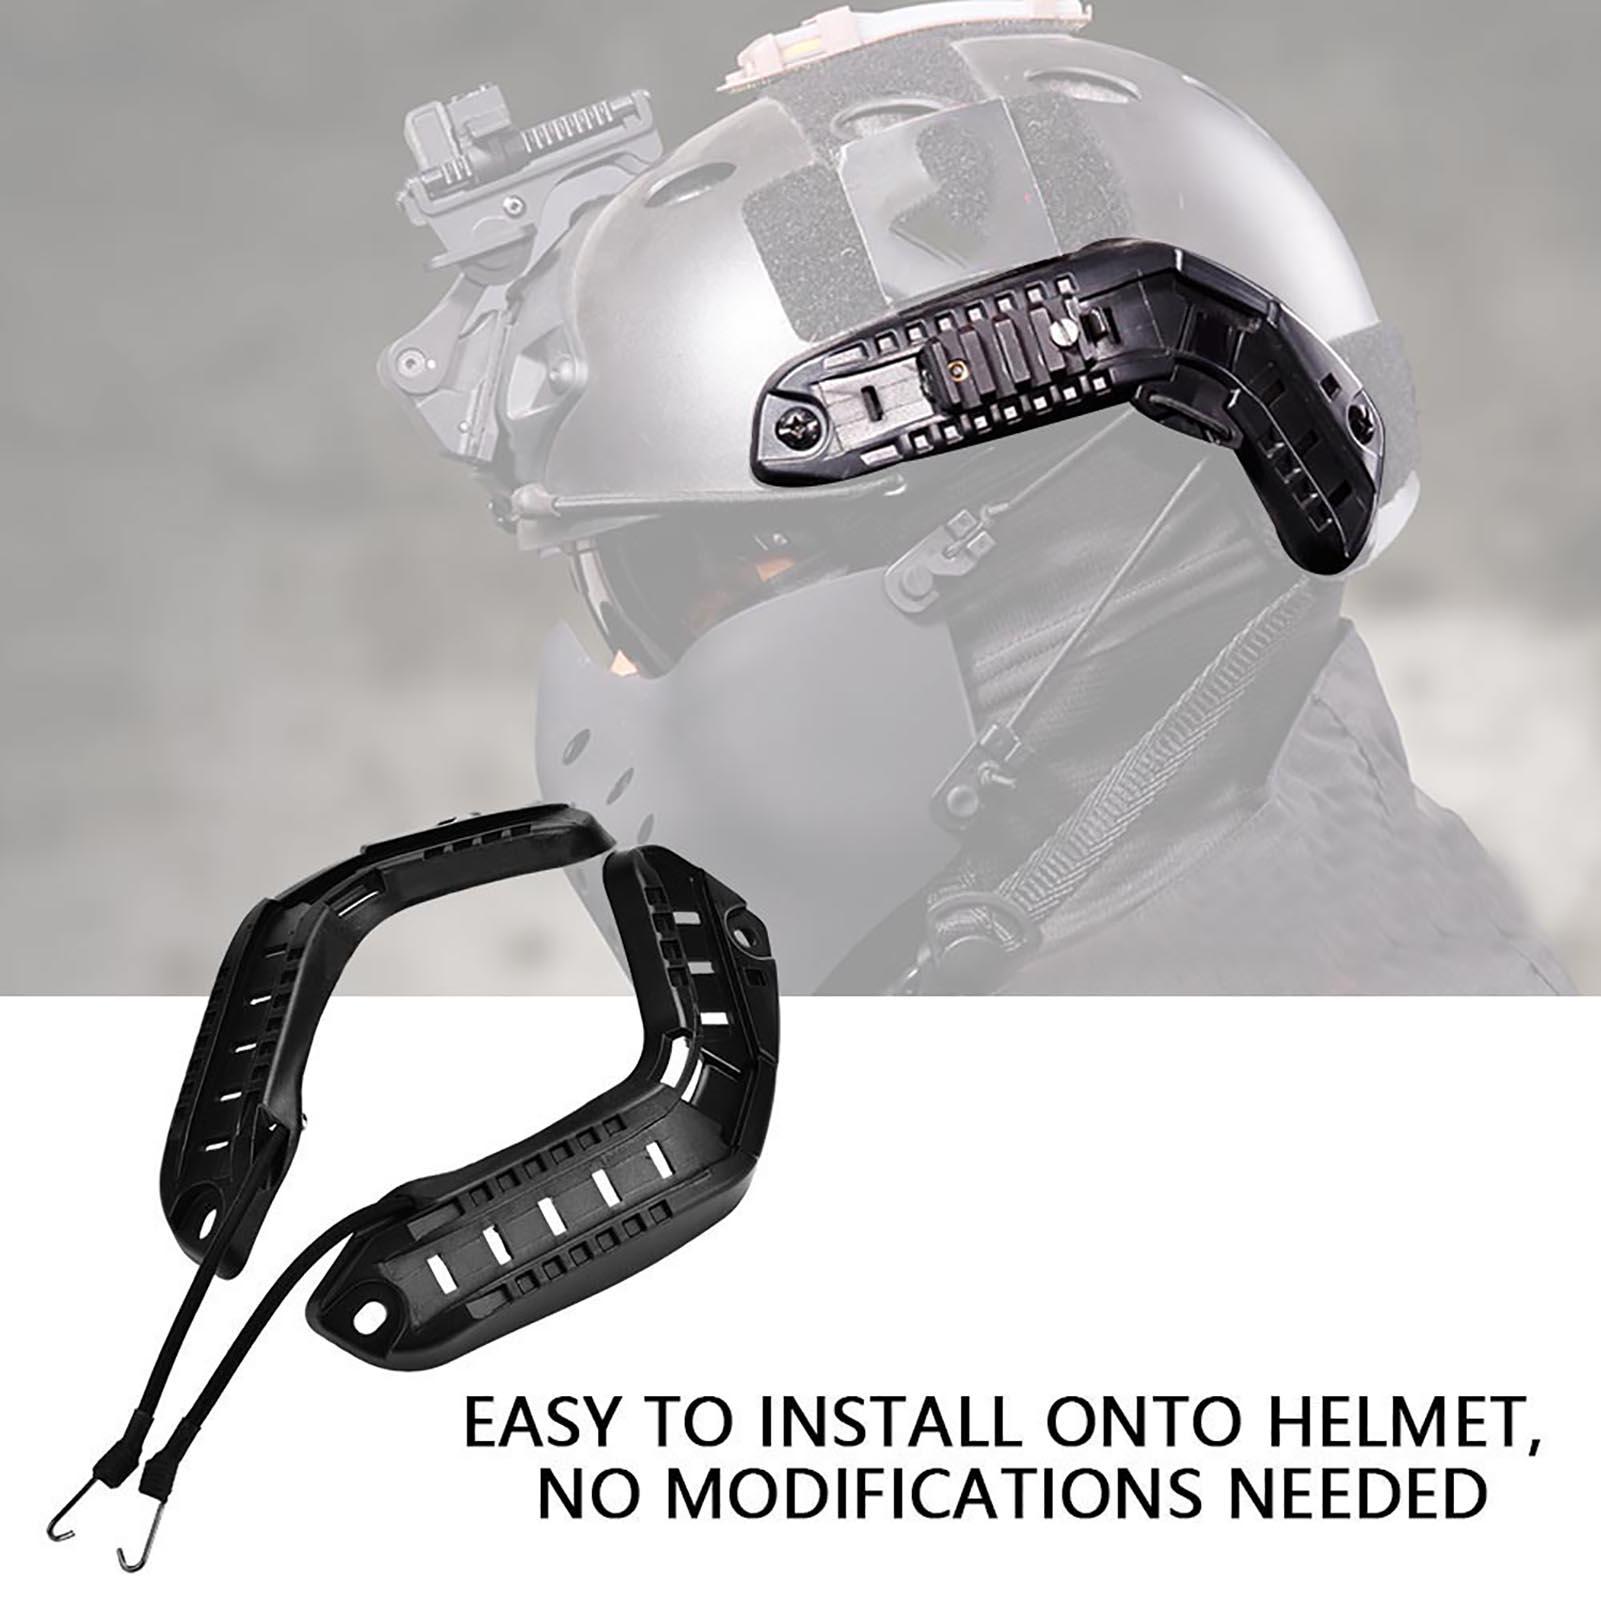 1Pair-Helmet-Side-Rails-for-Flashlight-Camera-Attachments-W-Mounting-Screws-Kit thumbnail 15